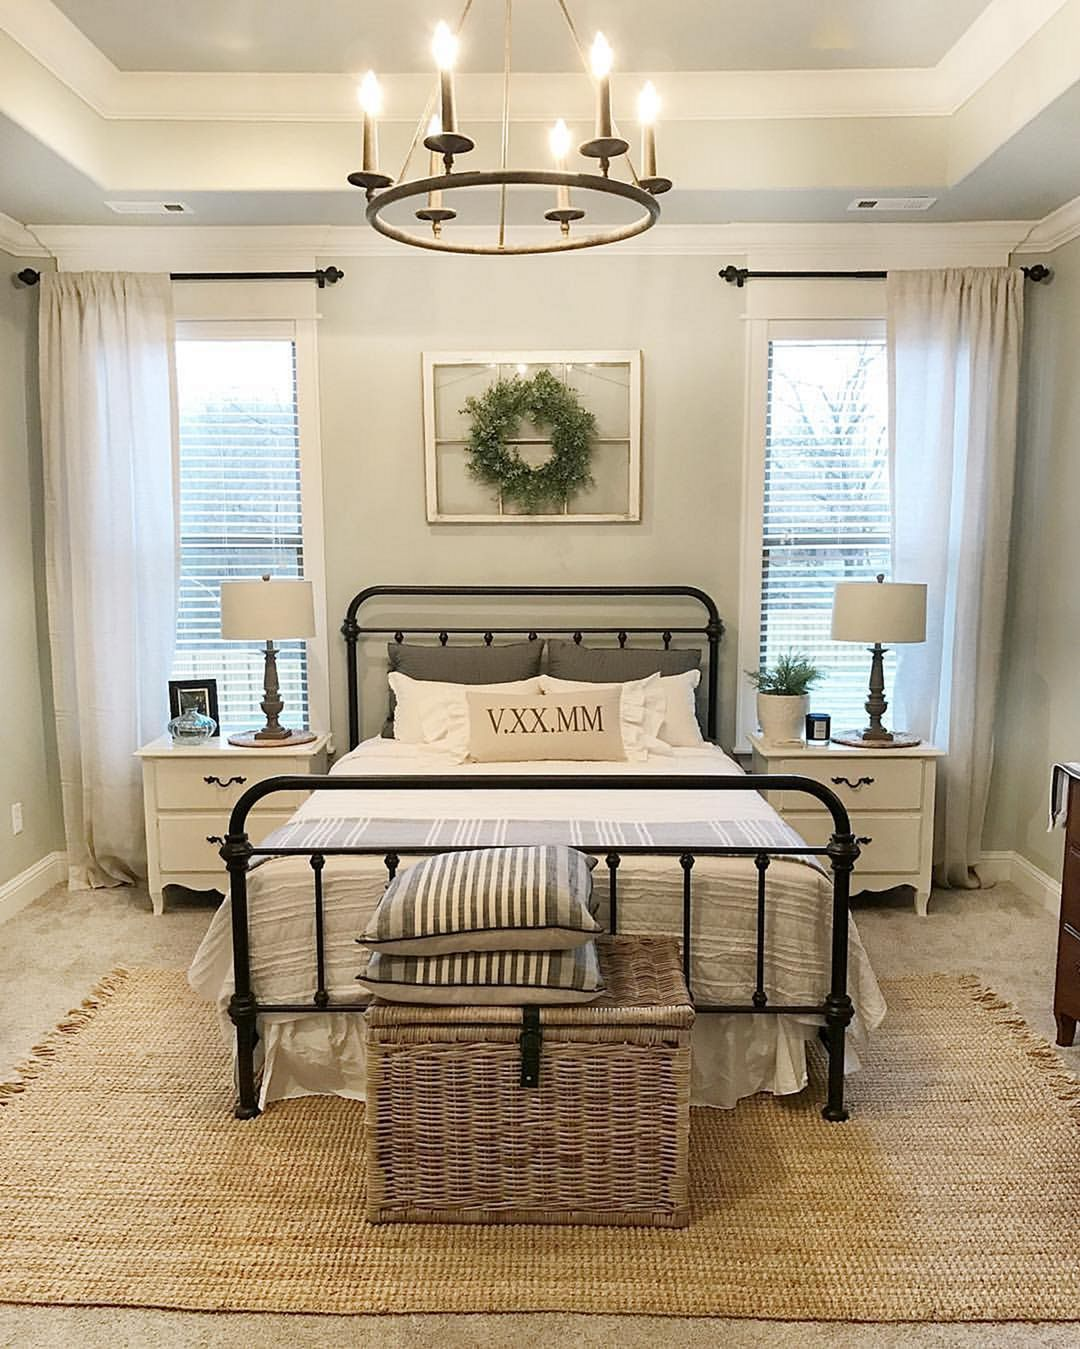 Guest Bedroom Decor Ideas Inspiration 121 Incredible Guest Bedroom Design Ideas 10923  Bedrooms Master Review